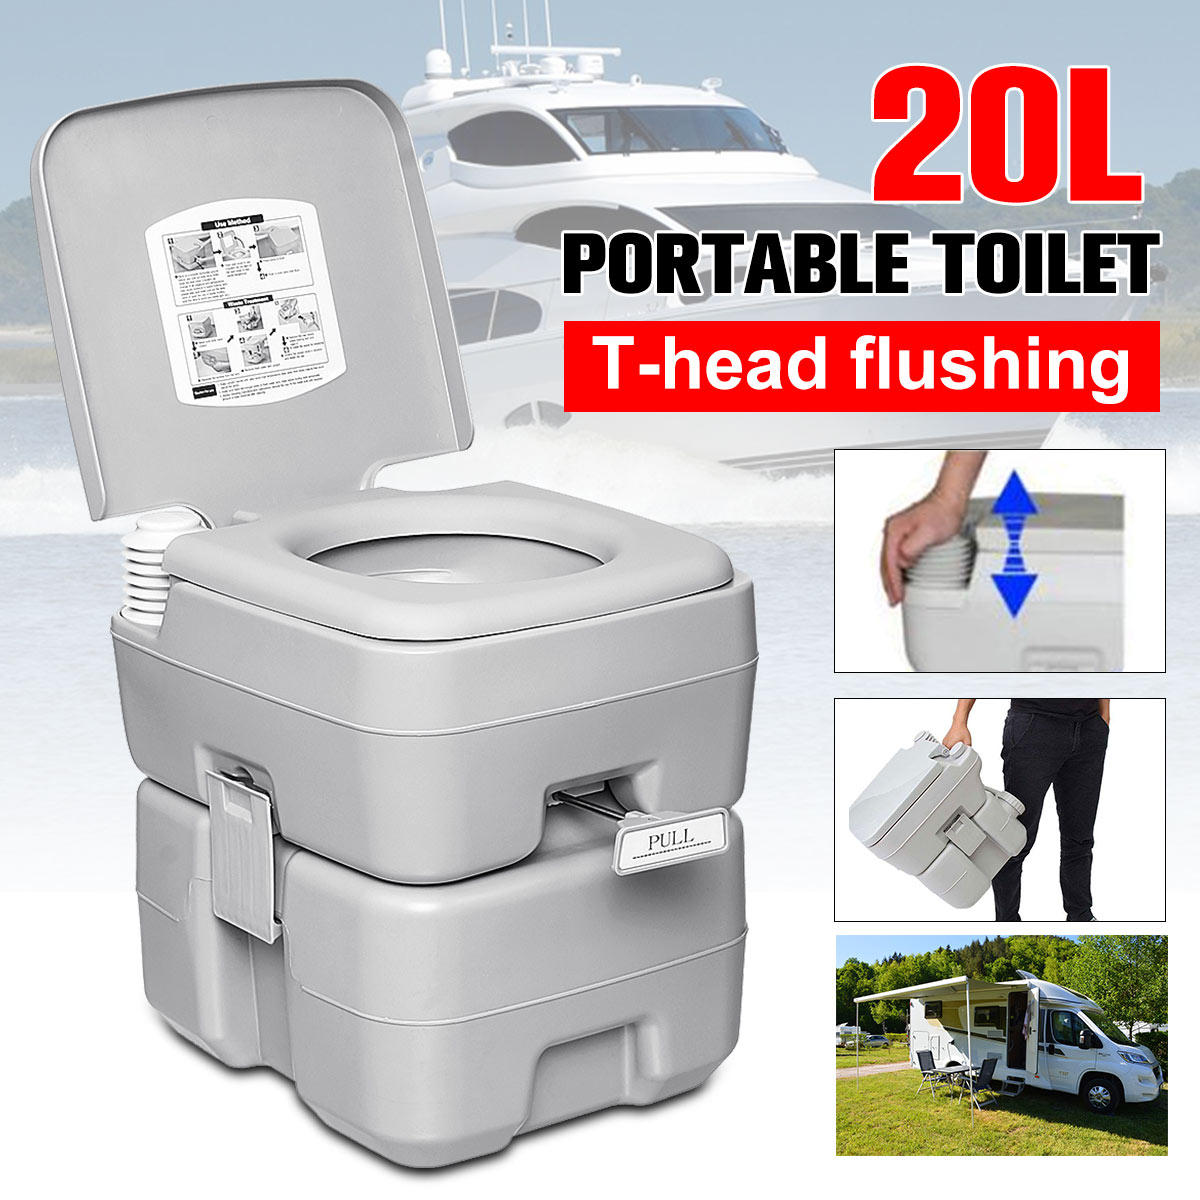 20L Outdoor Portable Camping Toilet Caravan Travel Camp Boating Fishing Flush Toilet